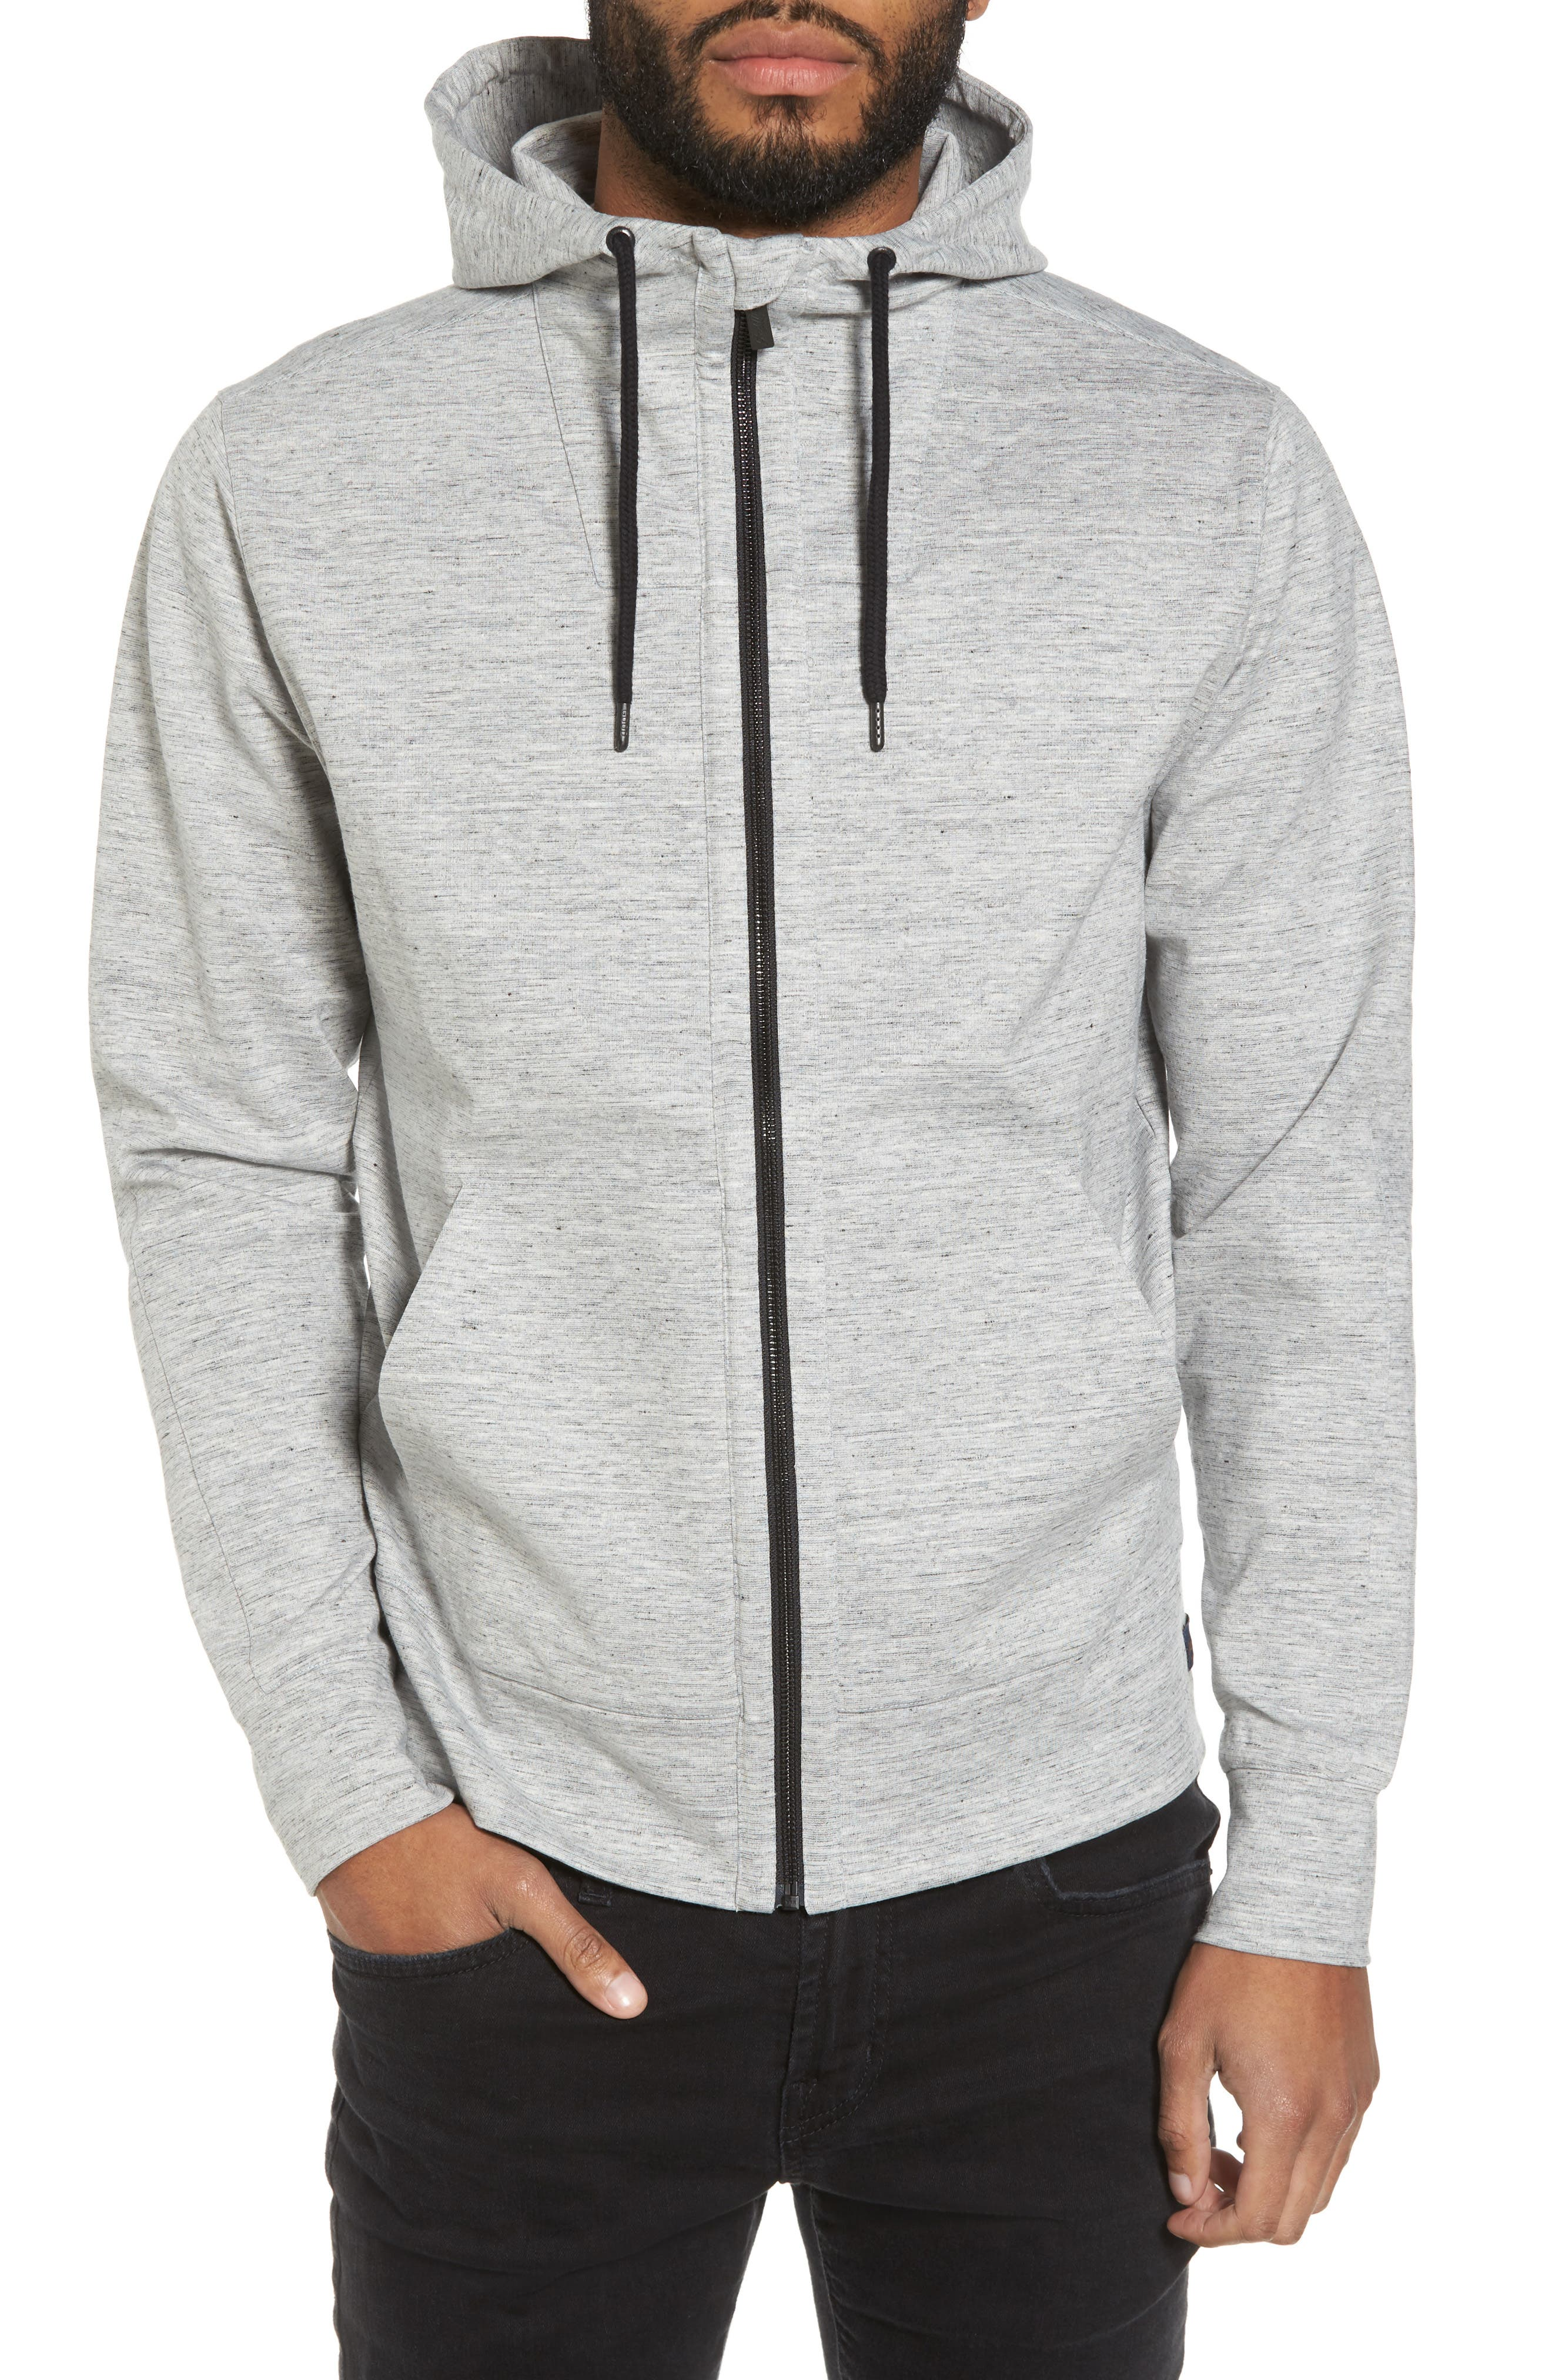 Main Image - Good Man Brand Pro Asymmetric Hoodie